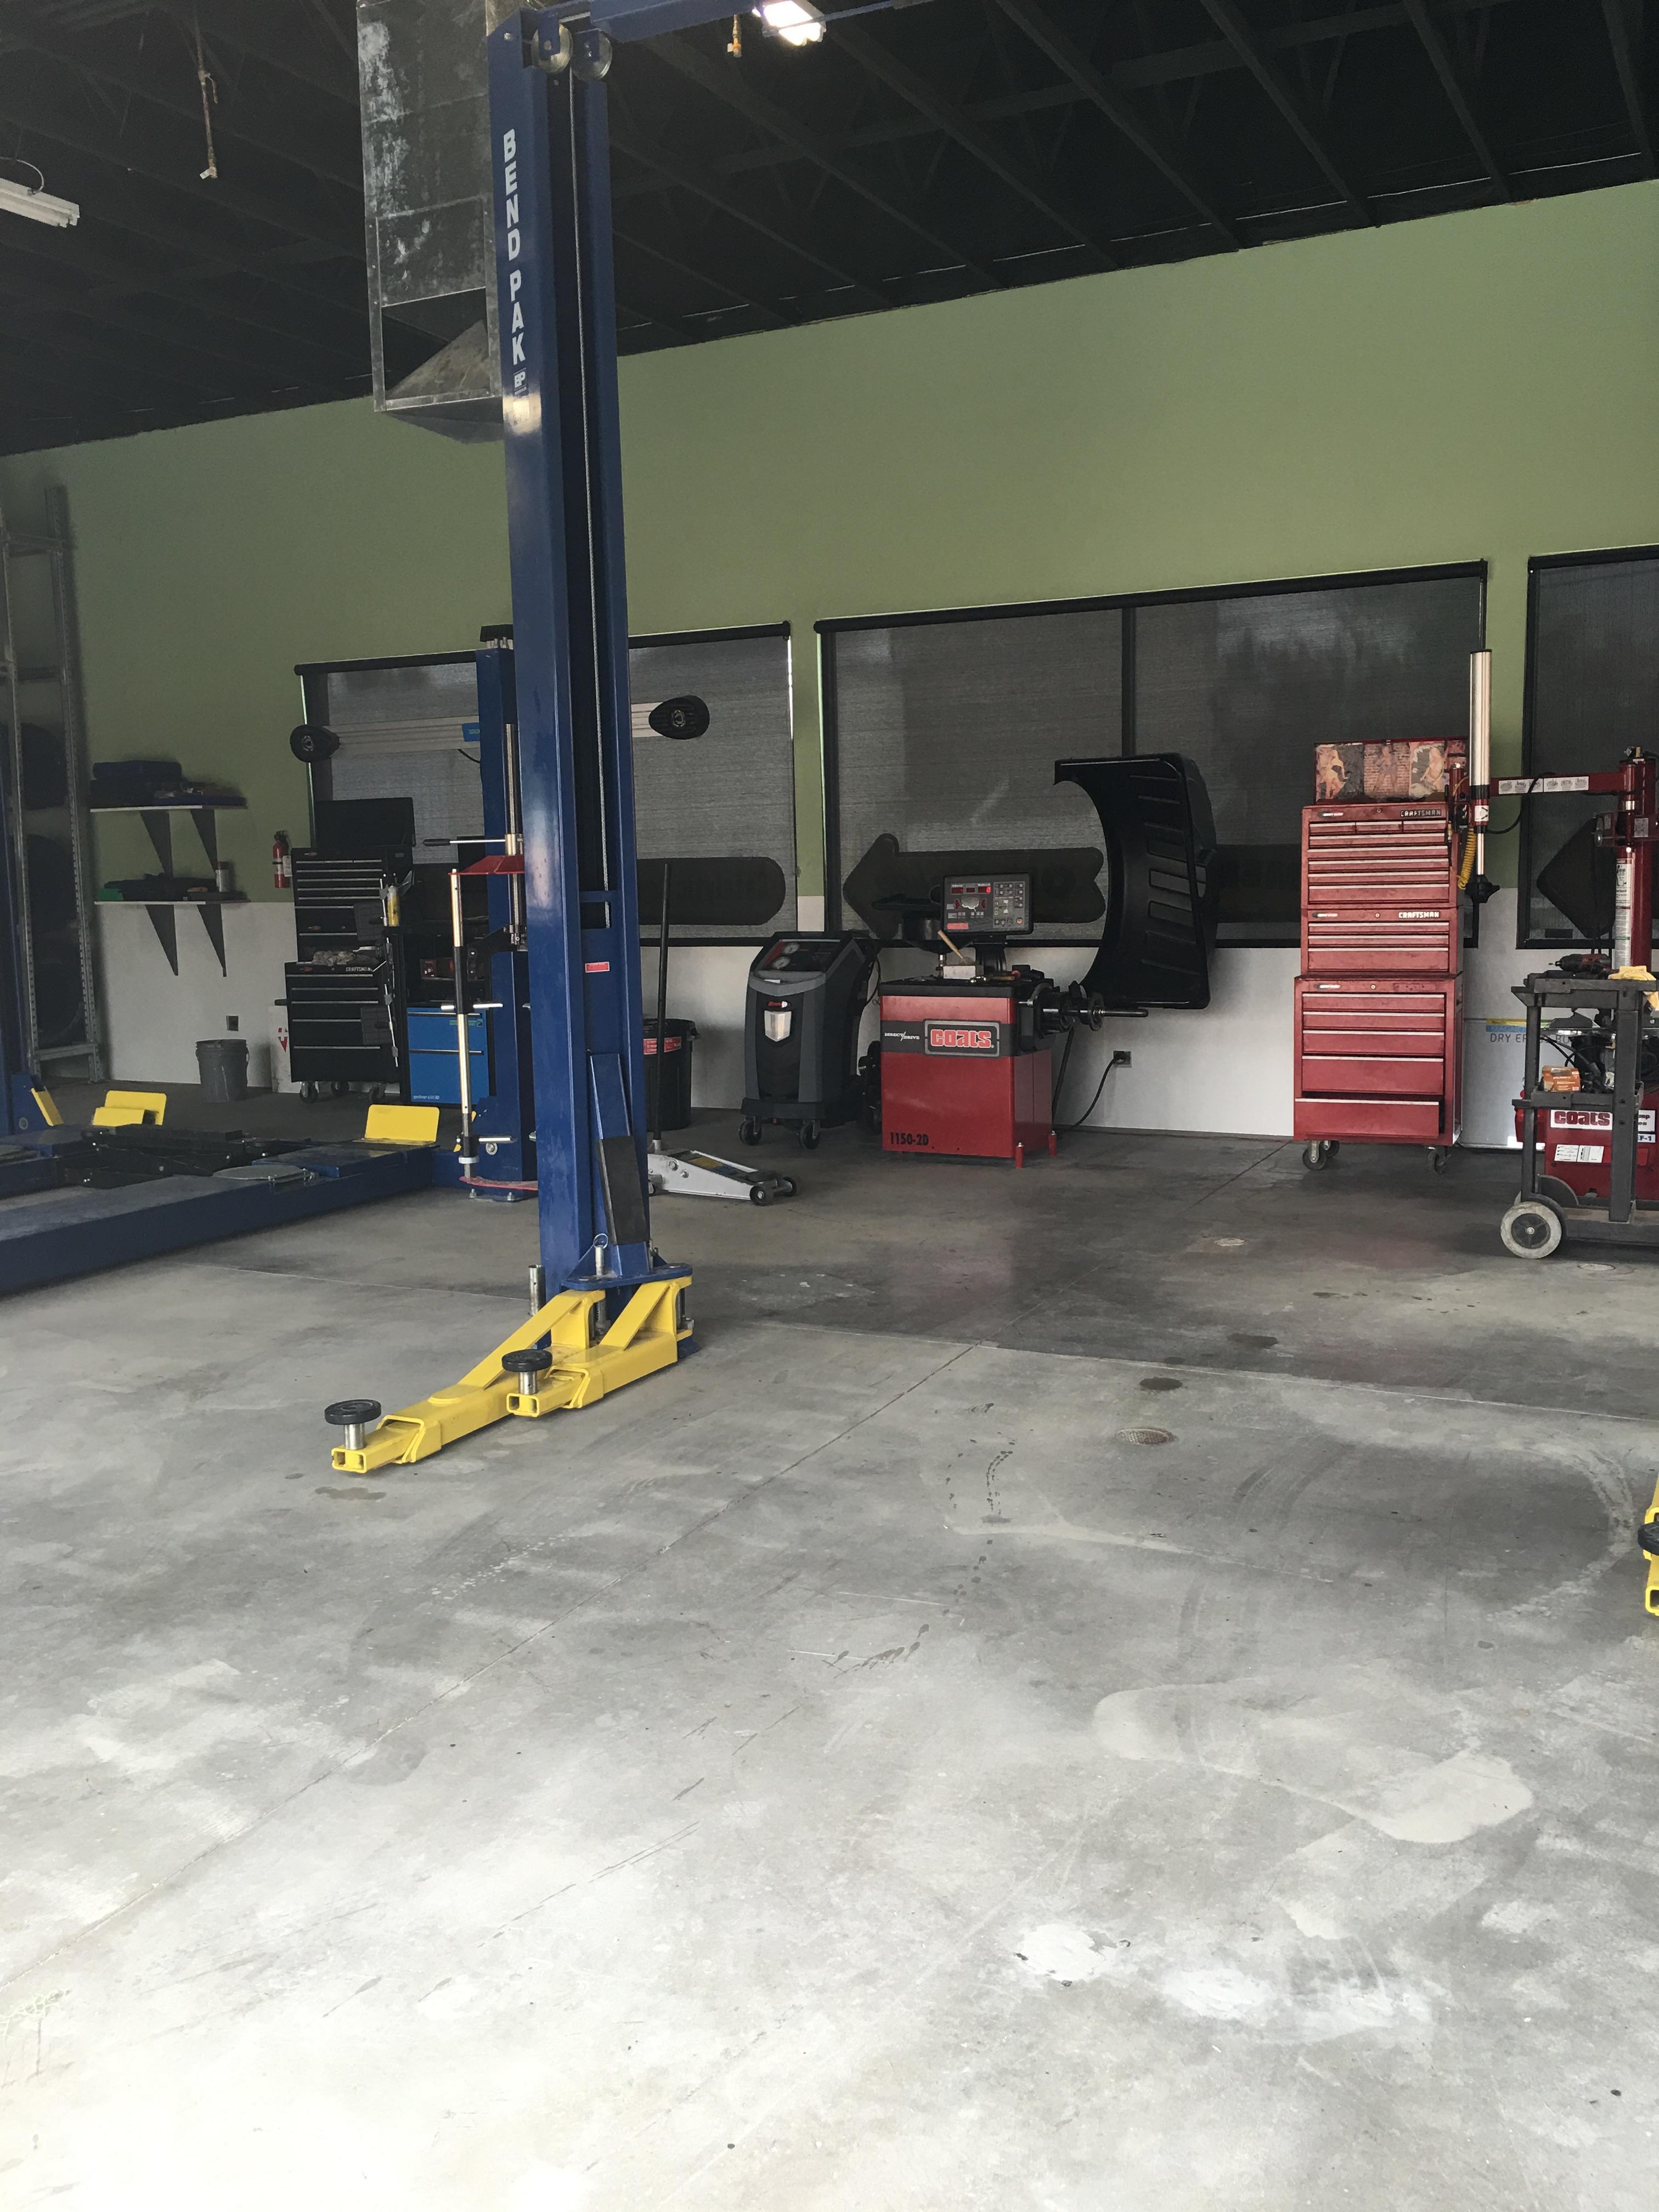 Chano 39 S Tire Shop And Auto Repair In Mesa Az 85203